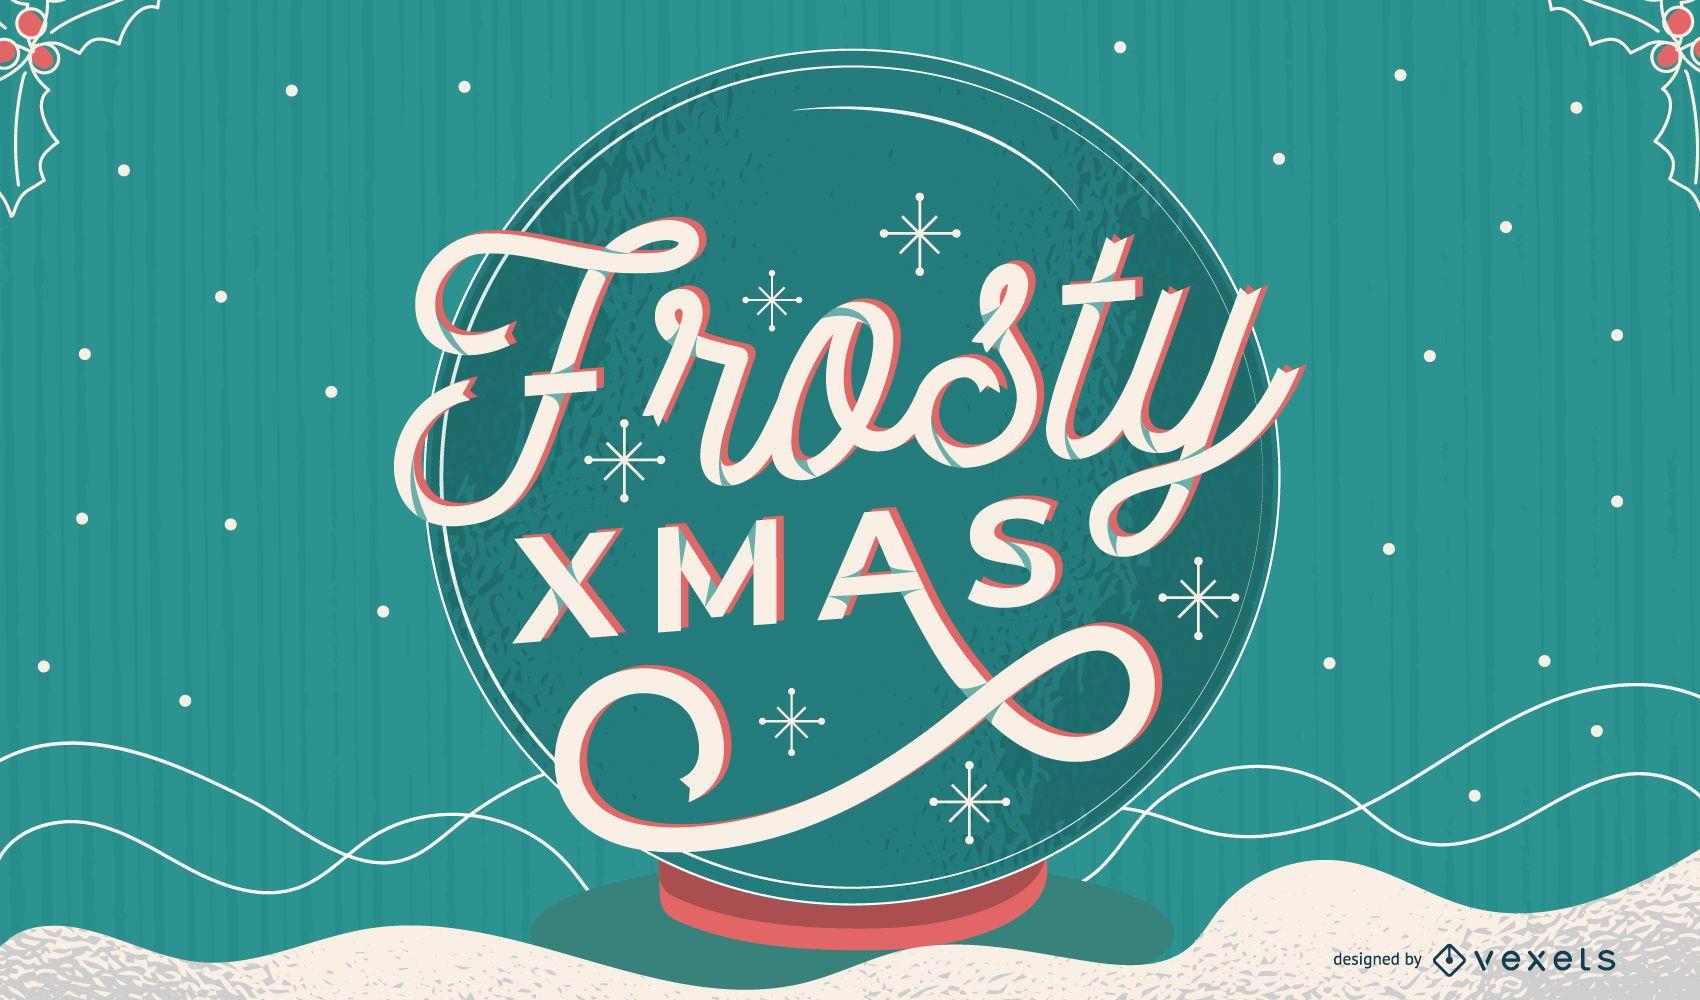 Frosty xmas lettering design